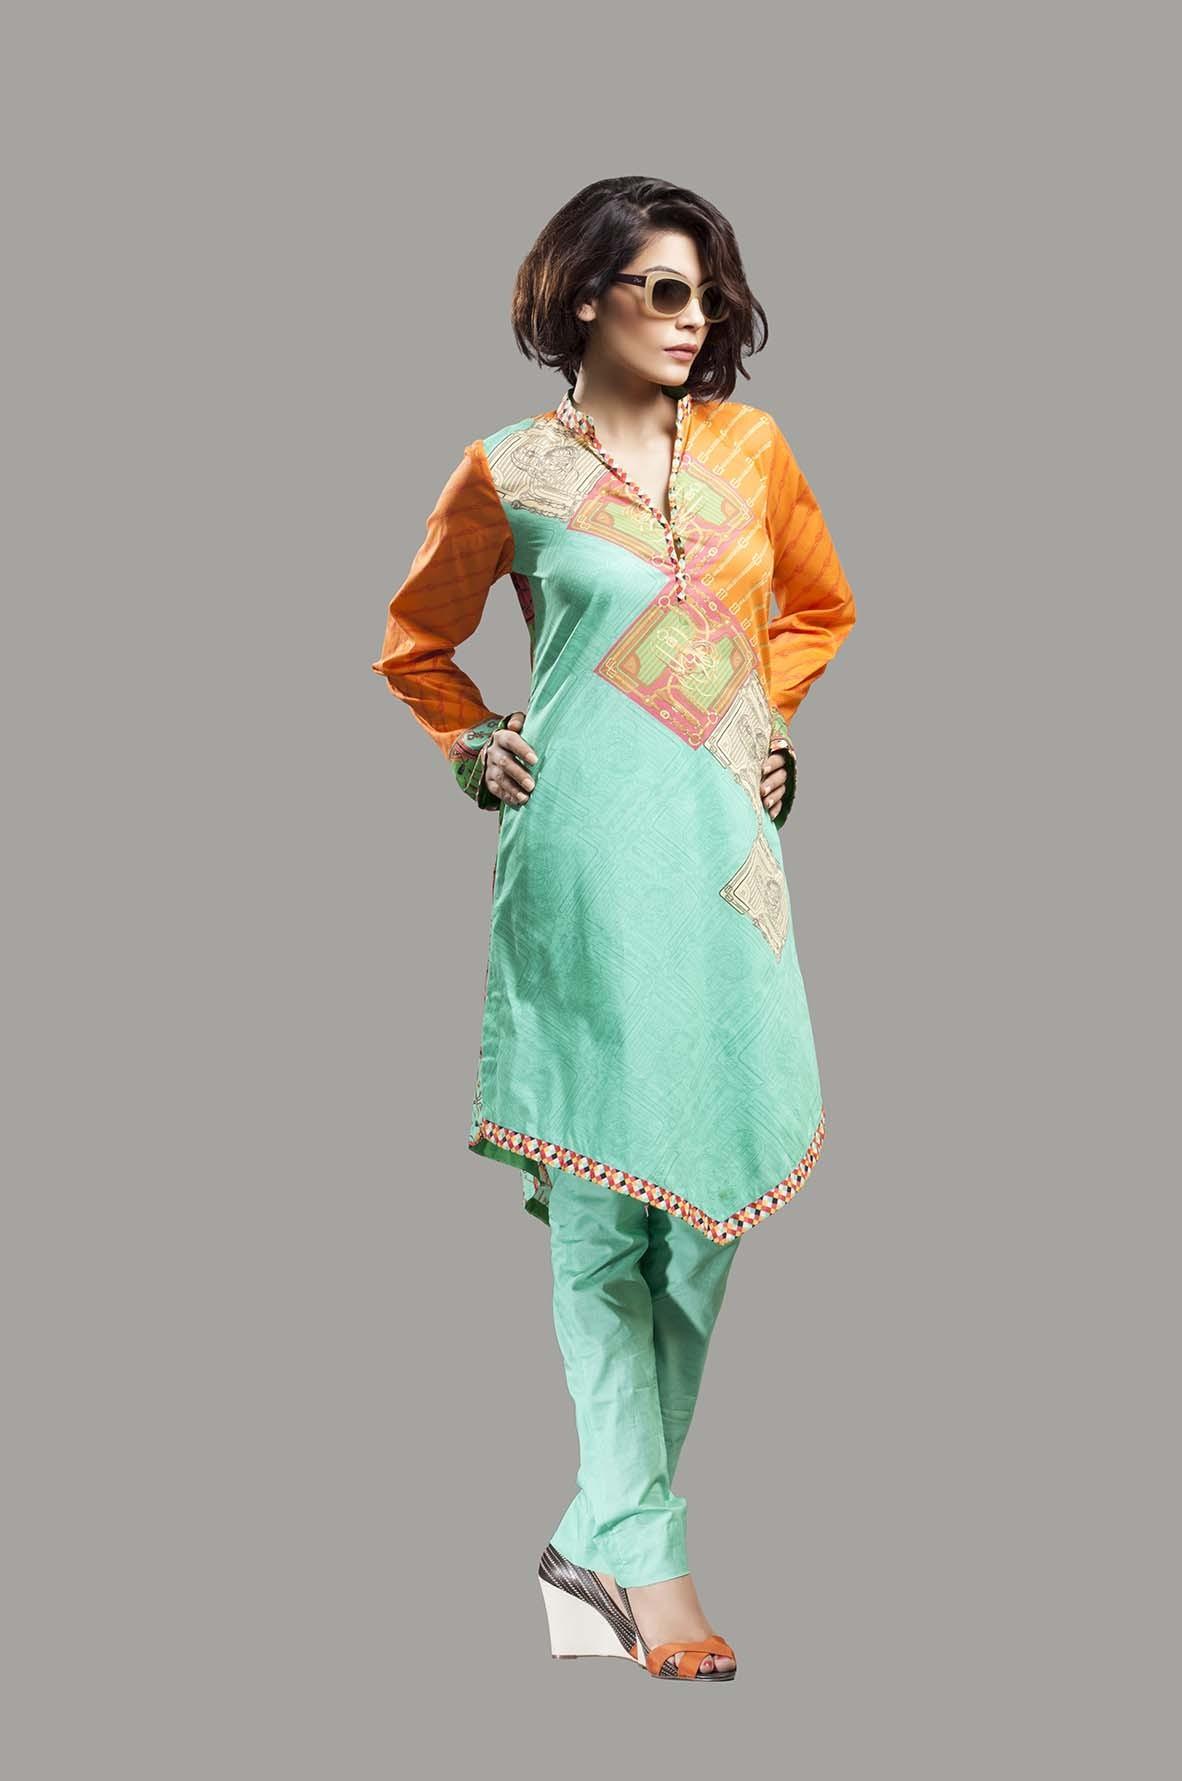 Kayseria Latest Winter Prints Best Shawls & Dresses 2014